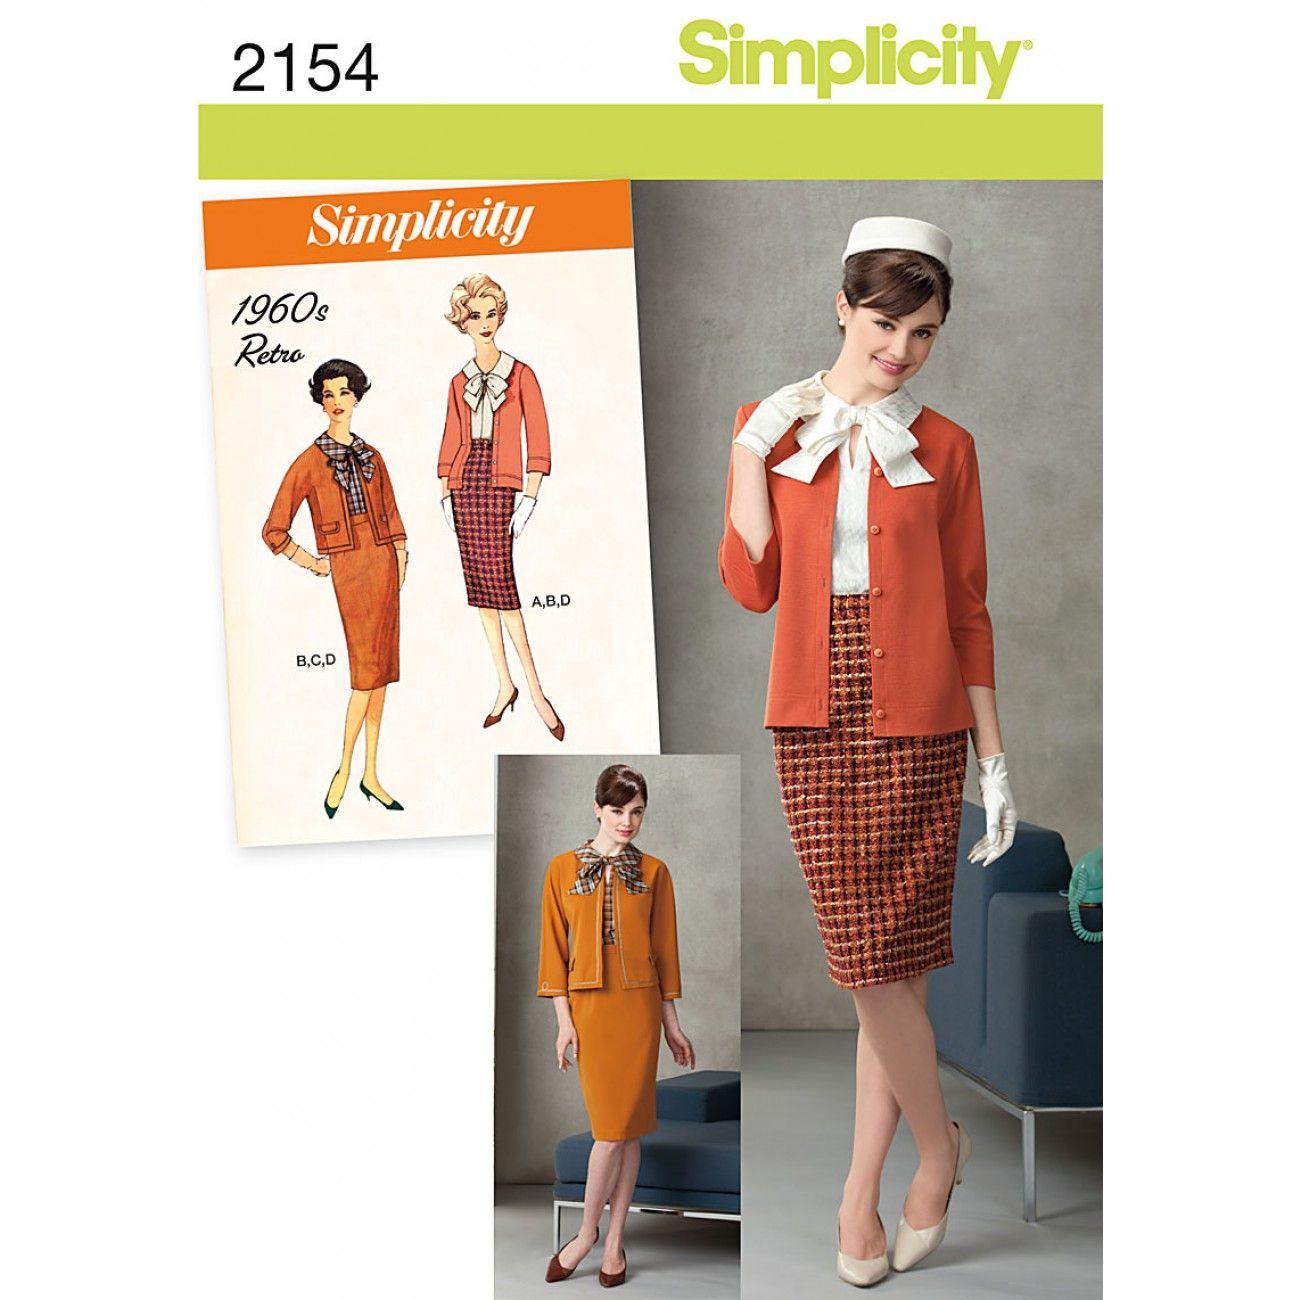 Simplicity pattern patterns fabric patterns shop online sewing projects jeuxipadfo Gallery